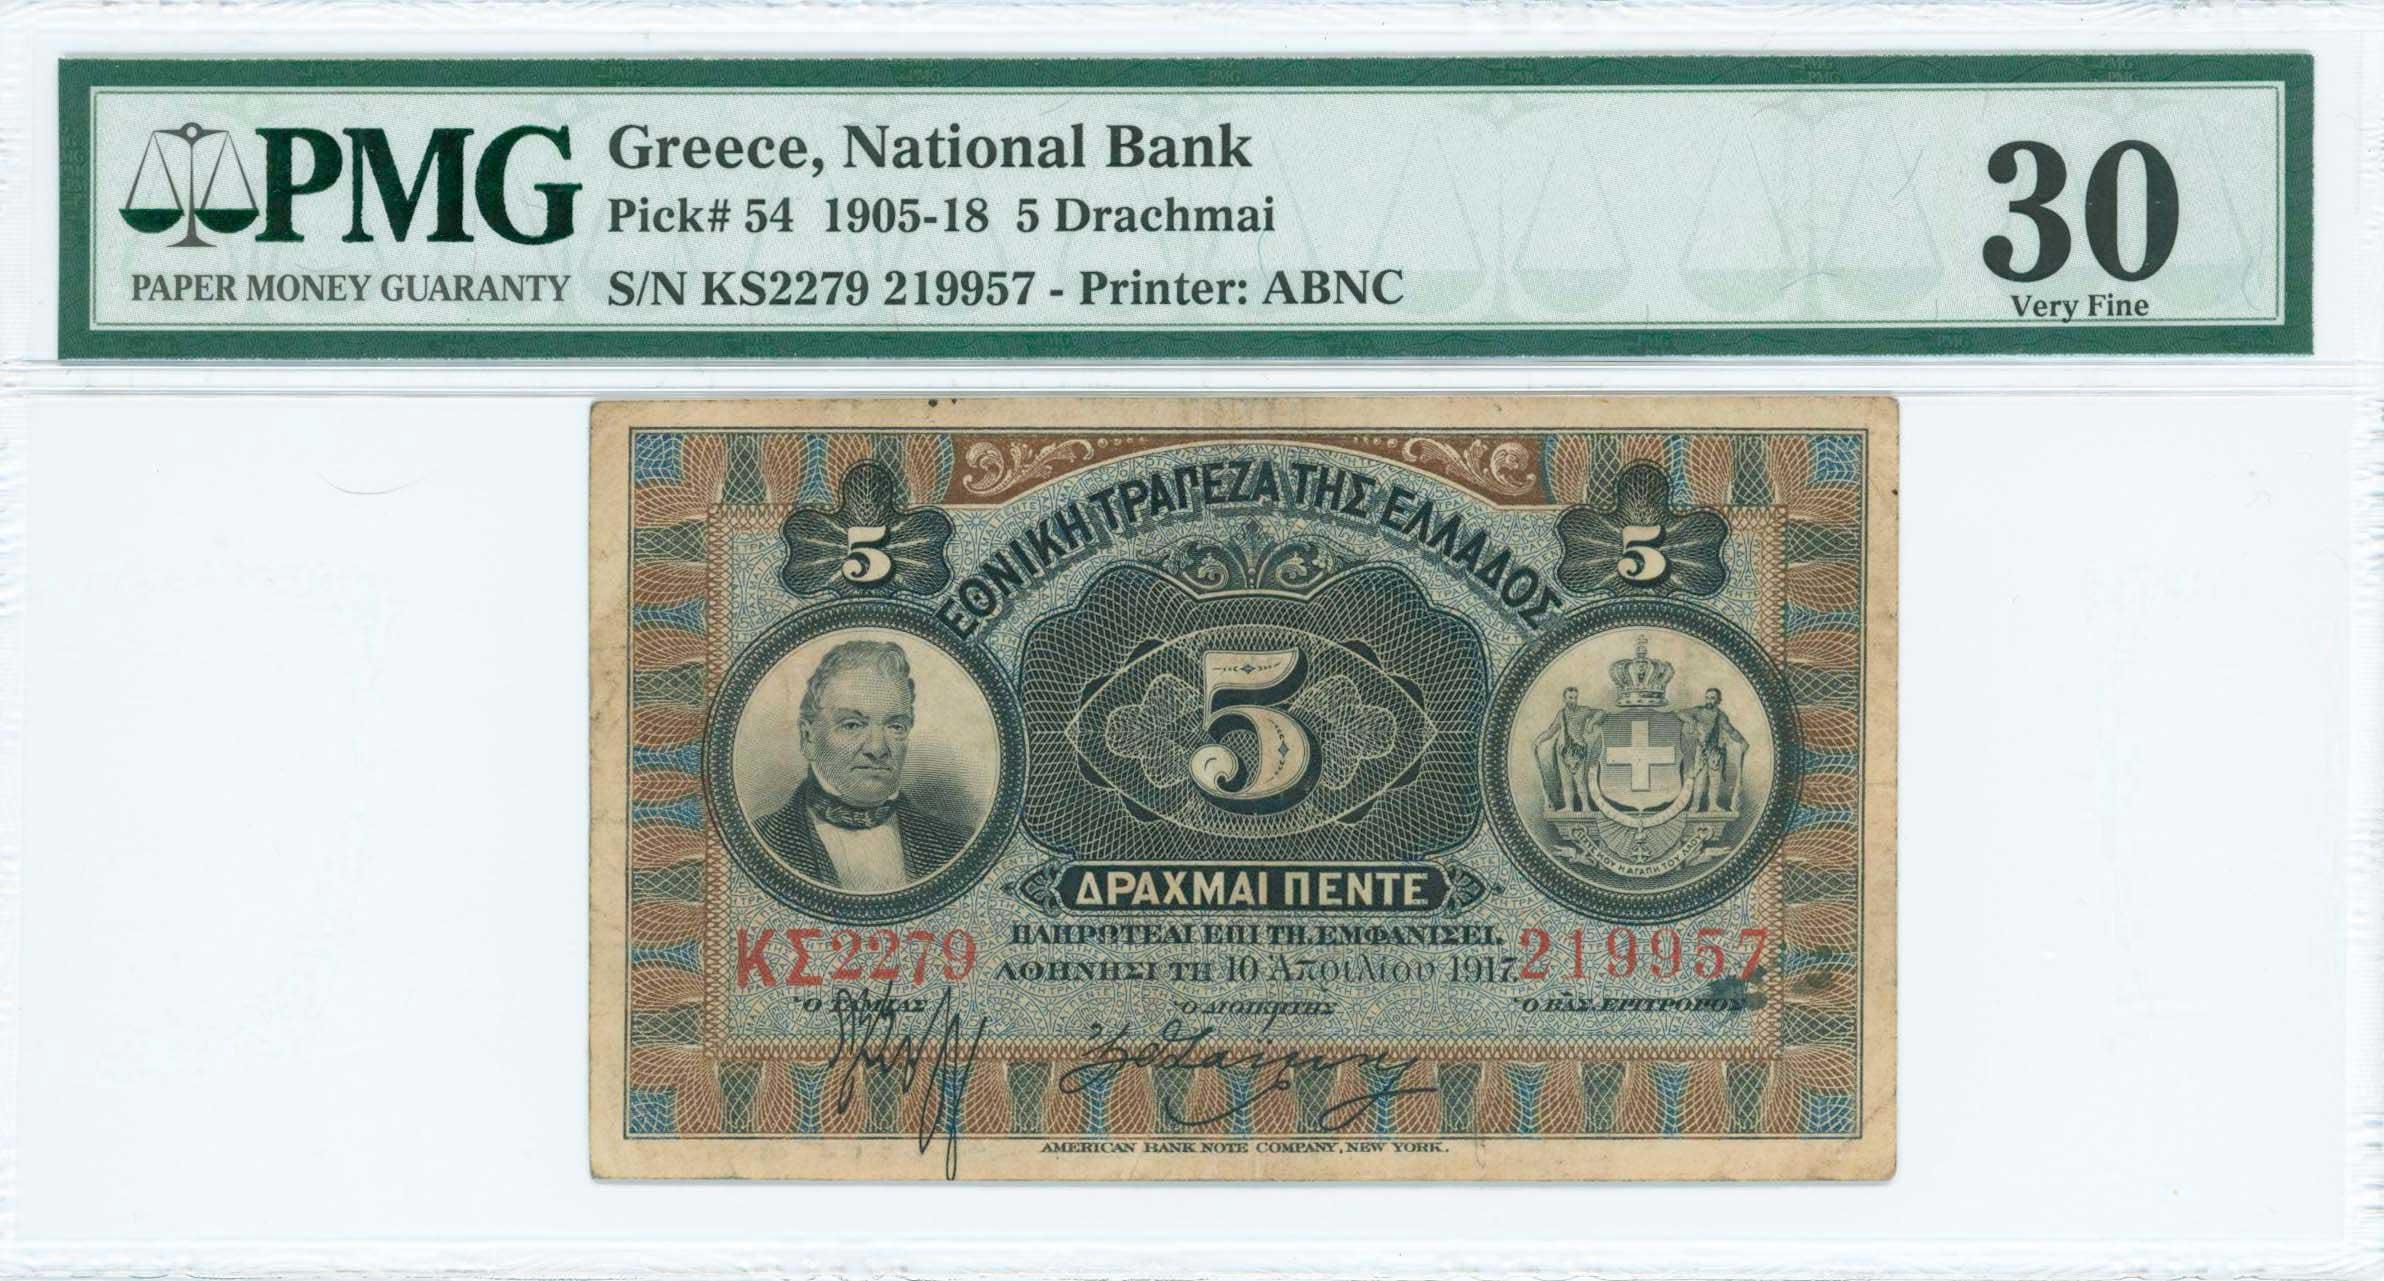 Lot 8438 - -  PAPER MONEY - BANKNOTES National Bank of Greece -  A. Karamitsos Public & Live Bid Auction 644 Coins, Medals & Banknotes